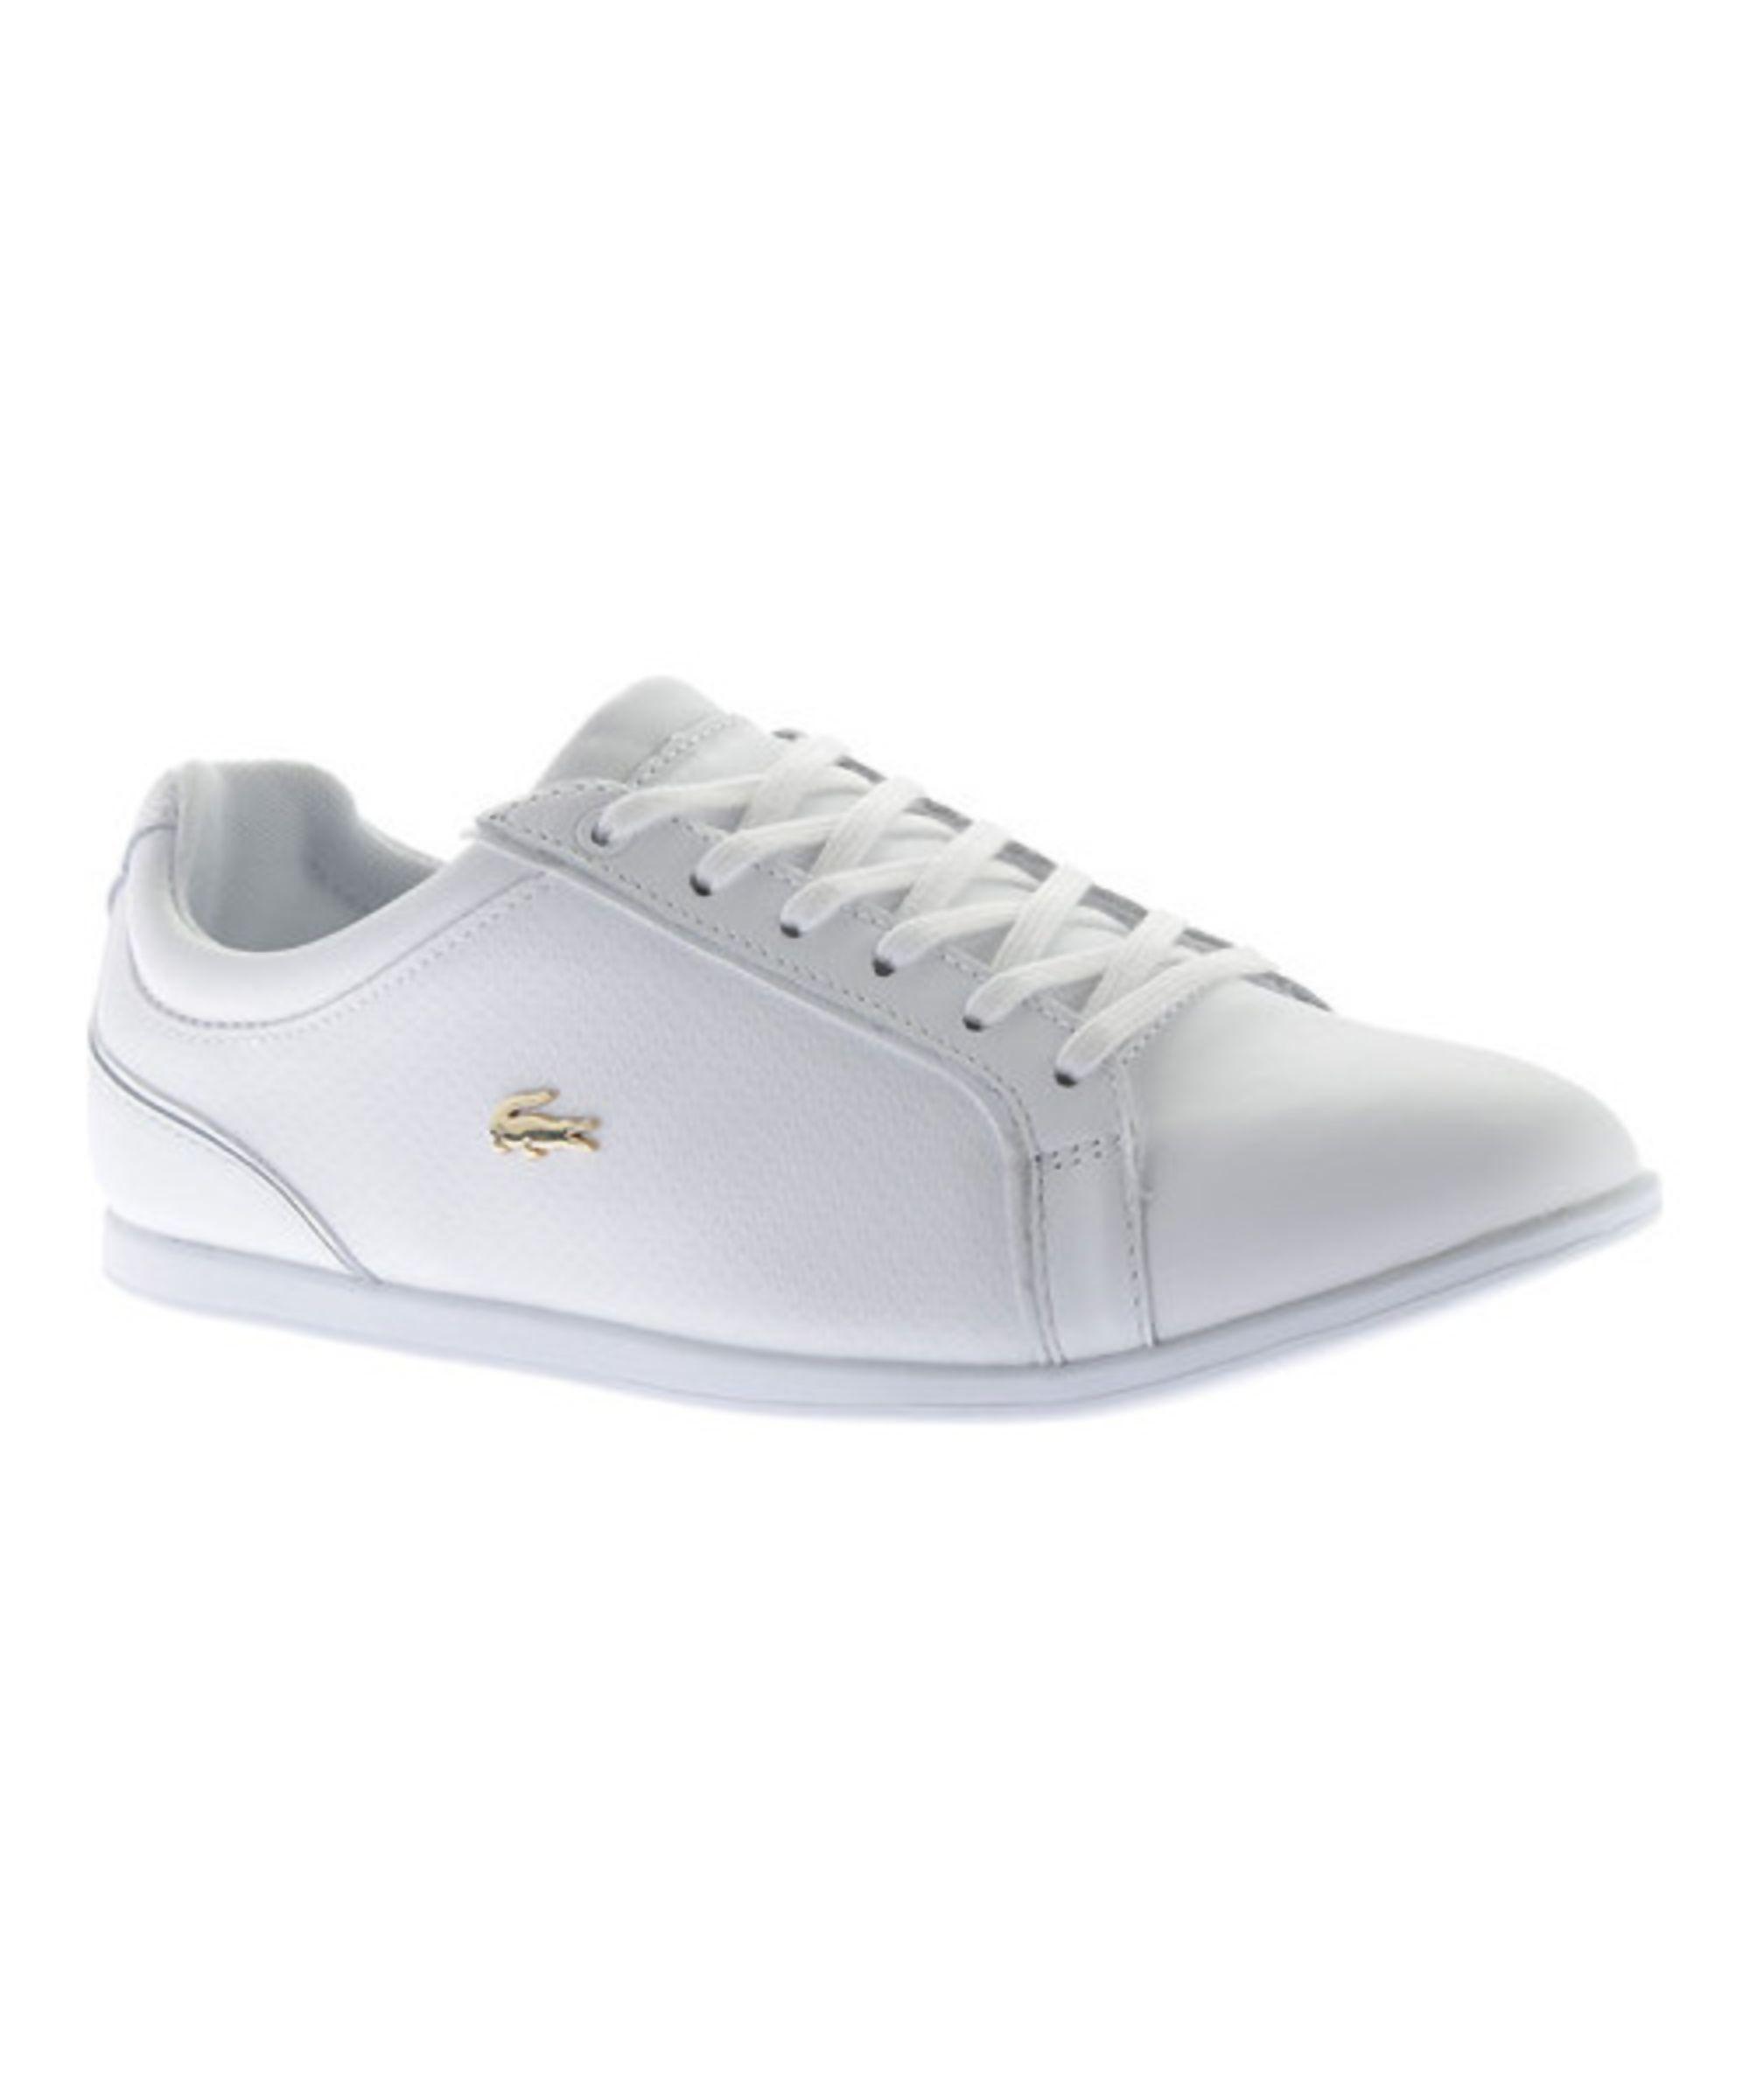 09058b5e11 LACOSTE | Lacoste Women's Rey Lace 1 Leather Sneaker #Shoes ...